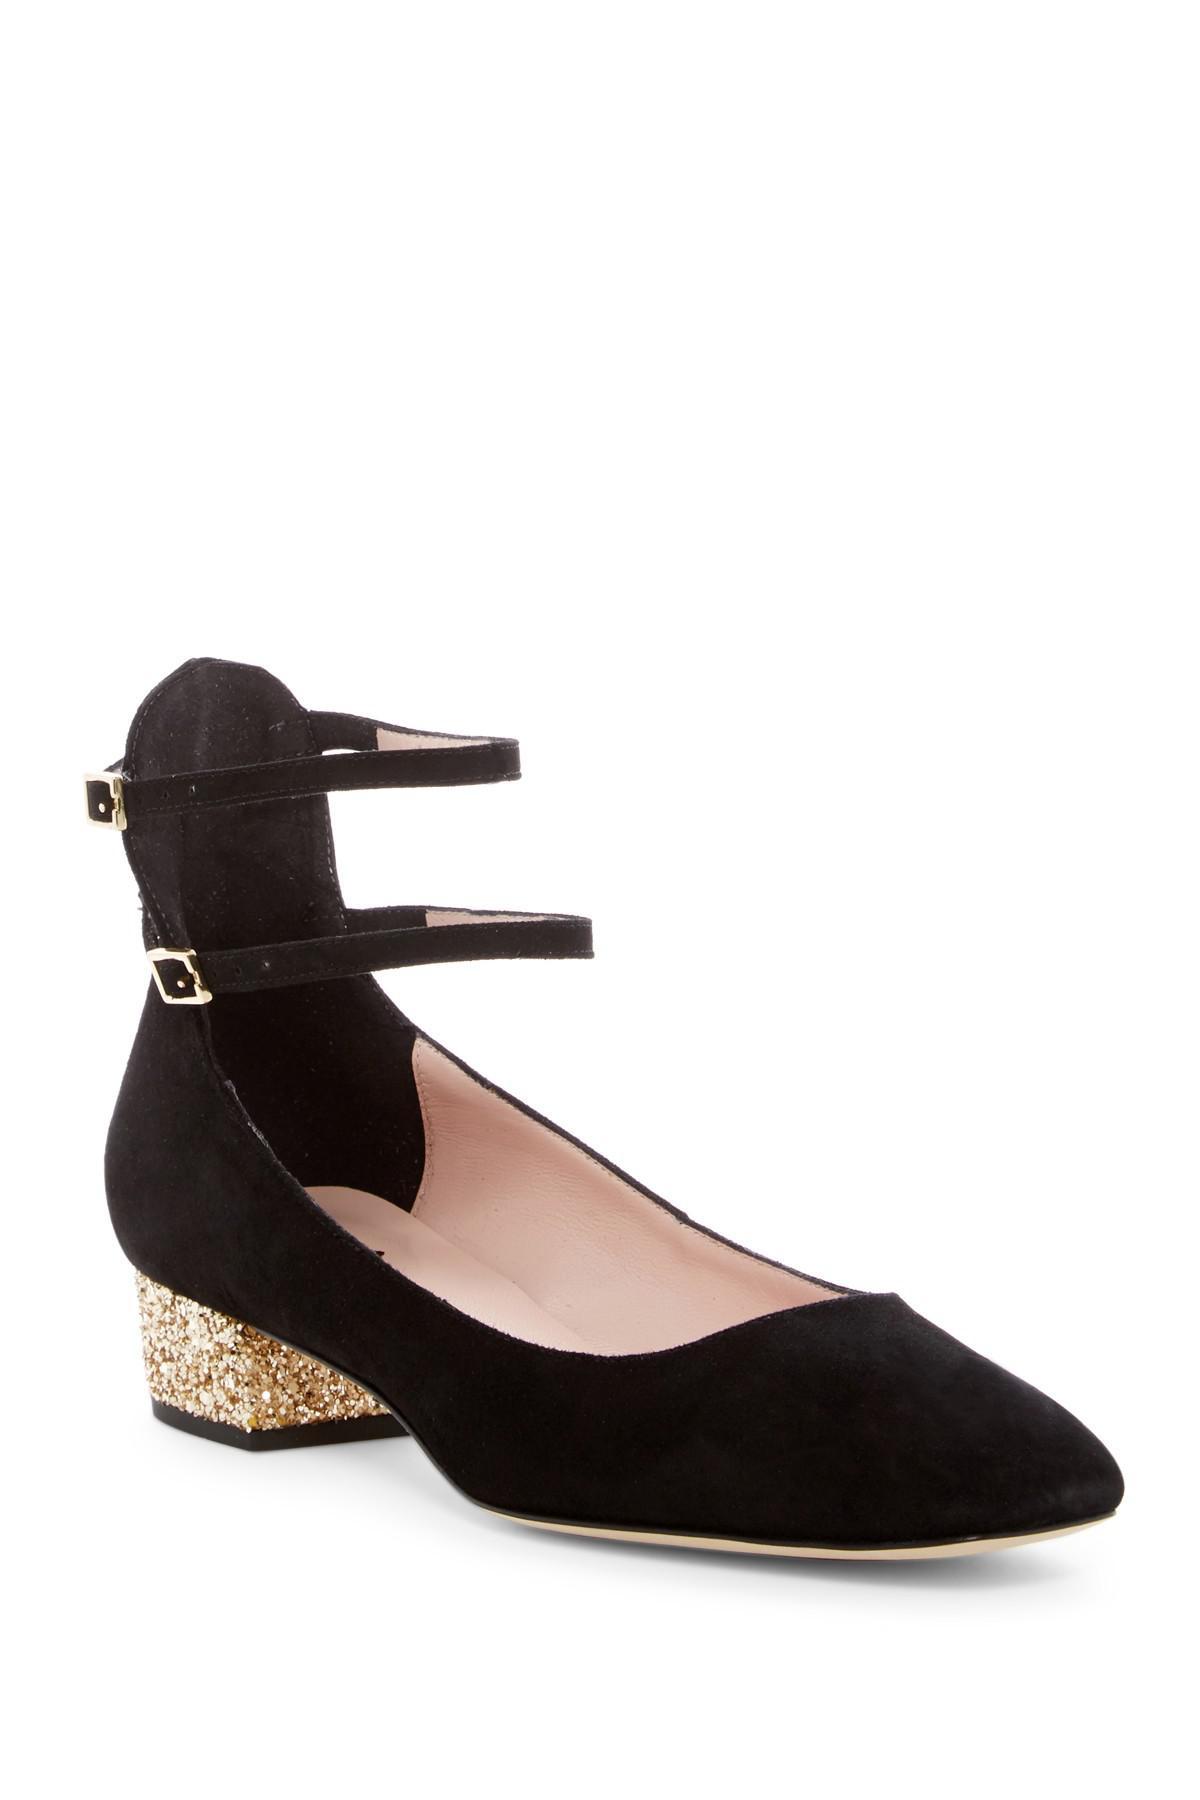 b0afa28cabb3 Lyst - Kate Spade Marcellina Dress Shoe in Black